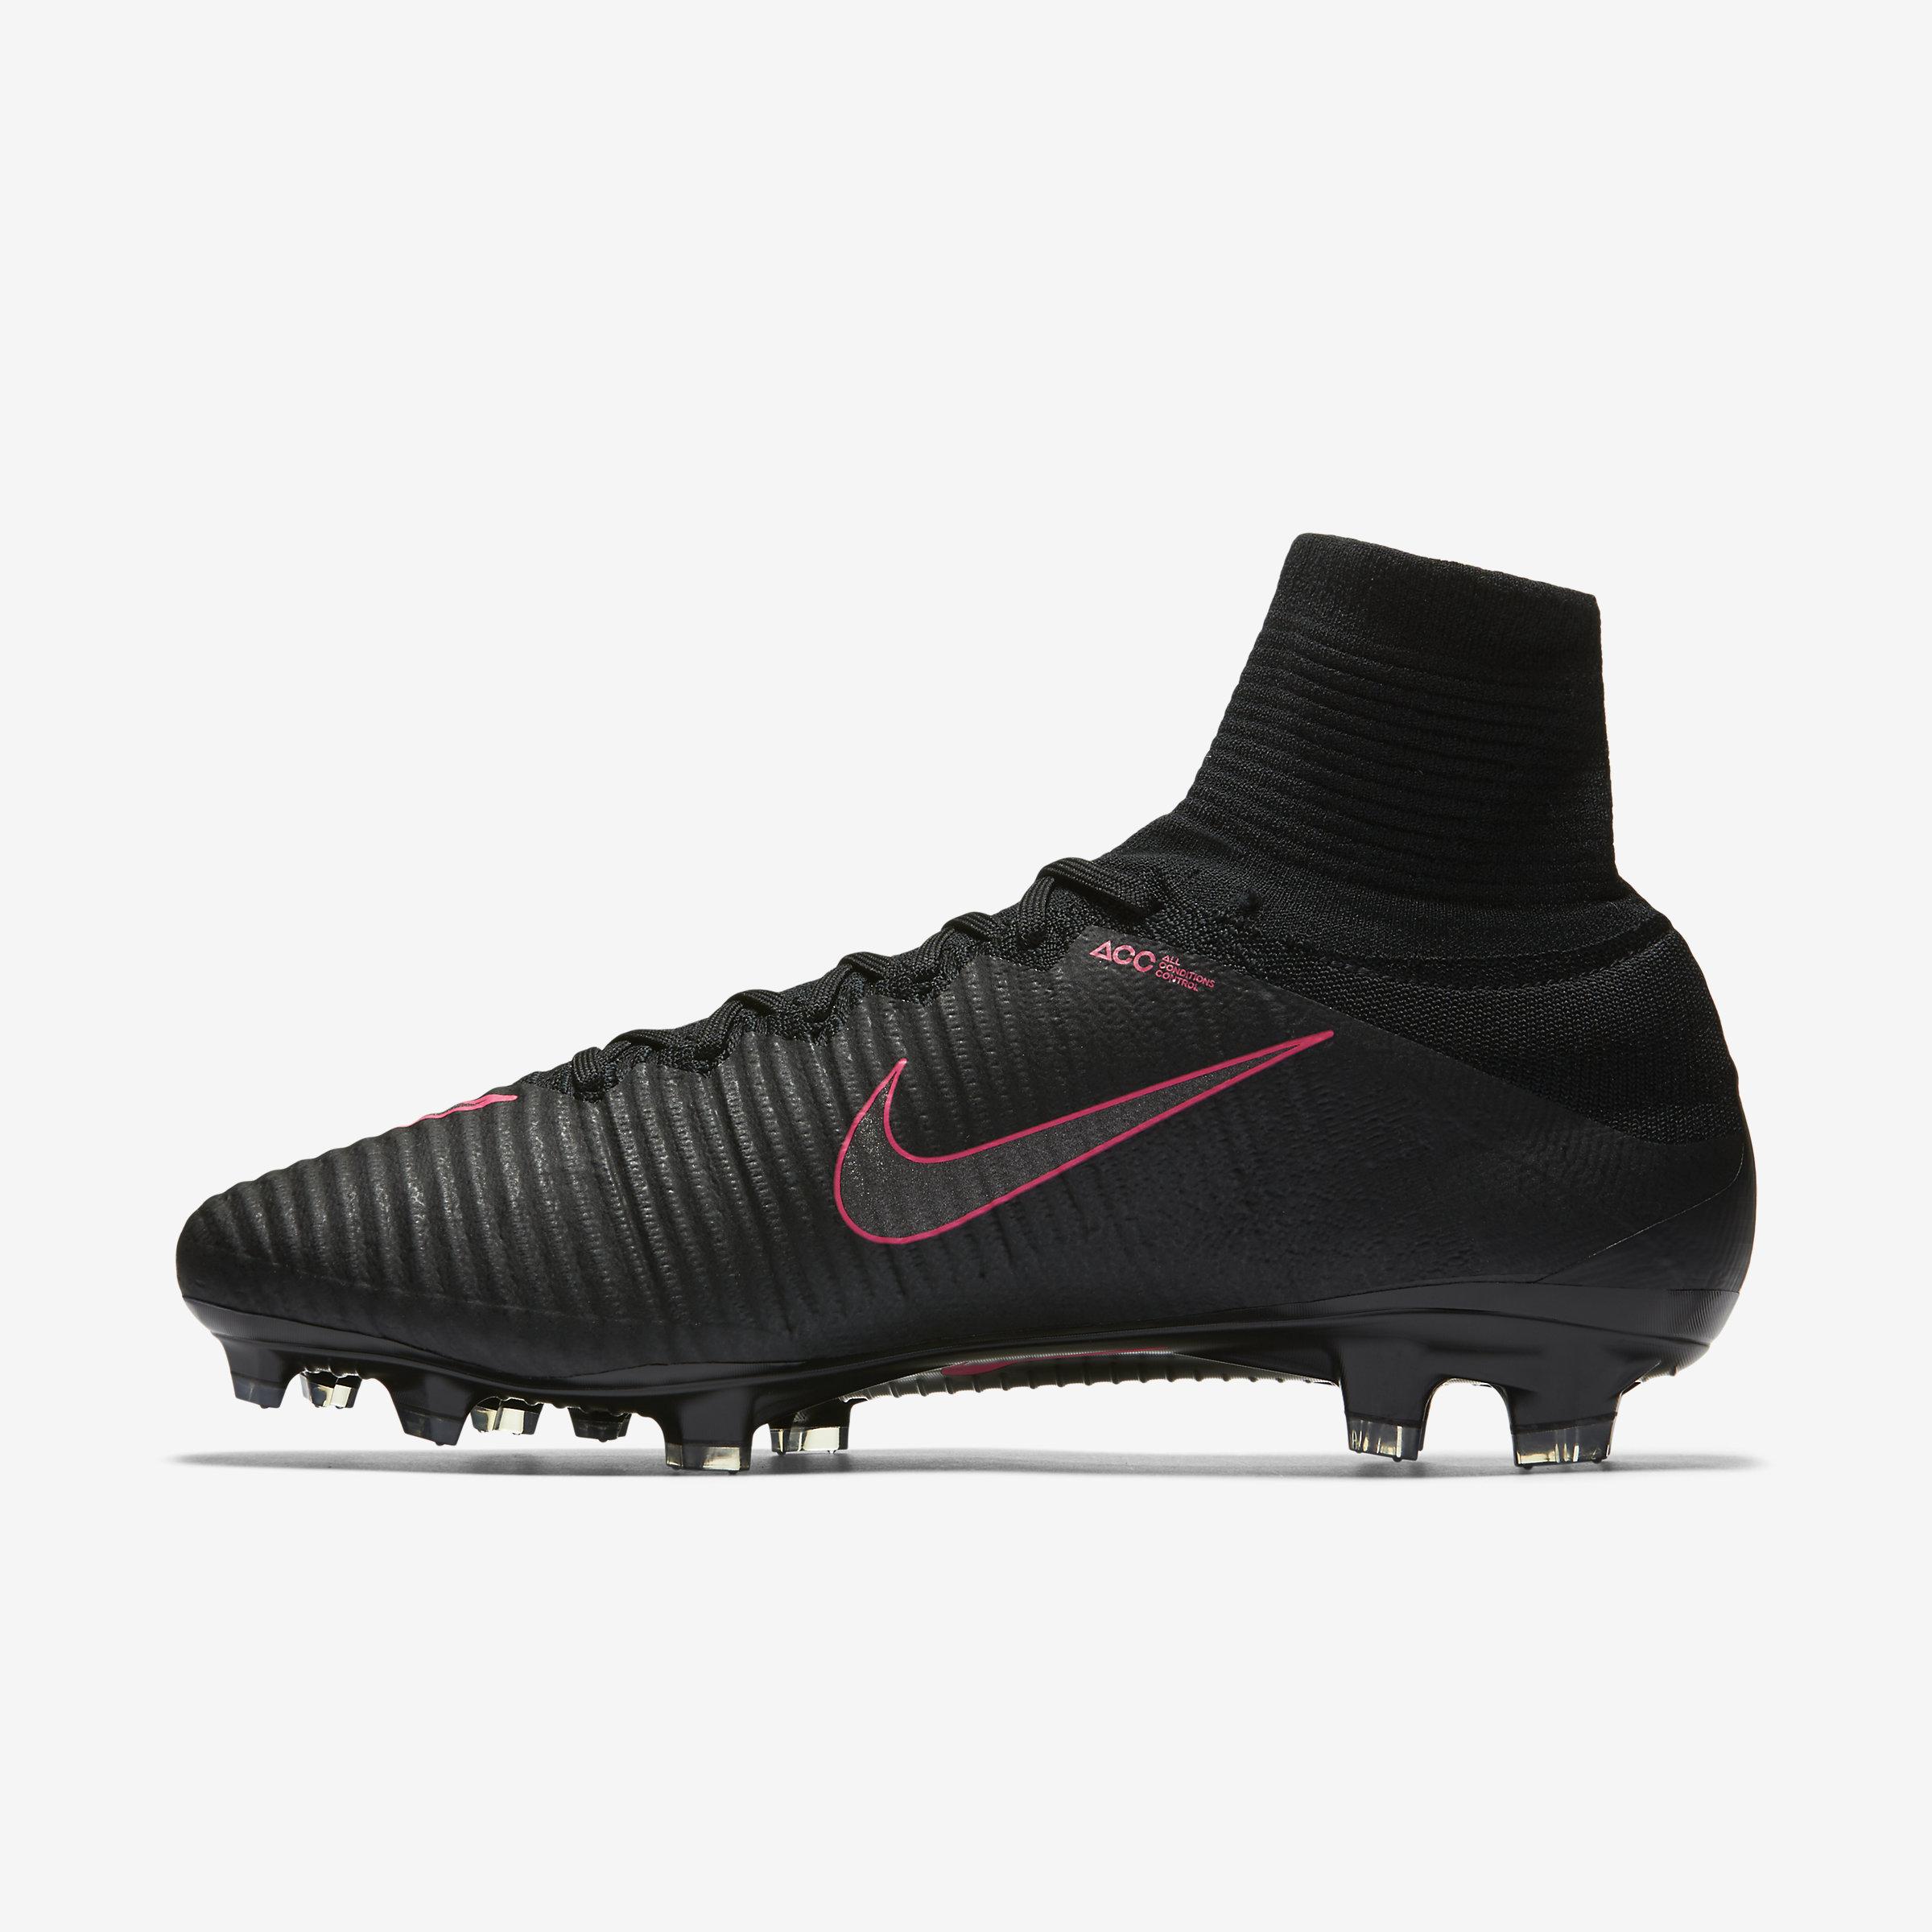 Nike Synthetic Mercurial Superfly V Fg in Black,Black (Black) for Men